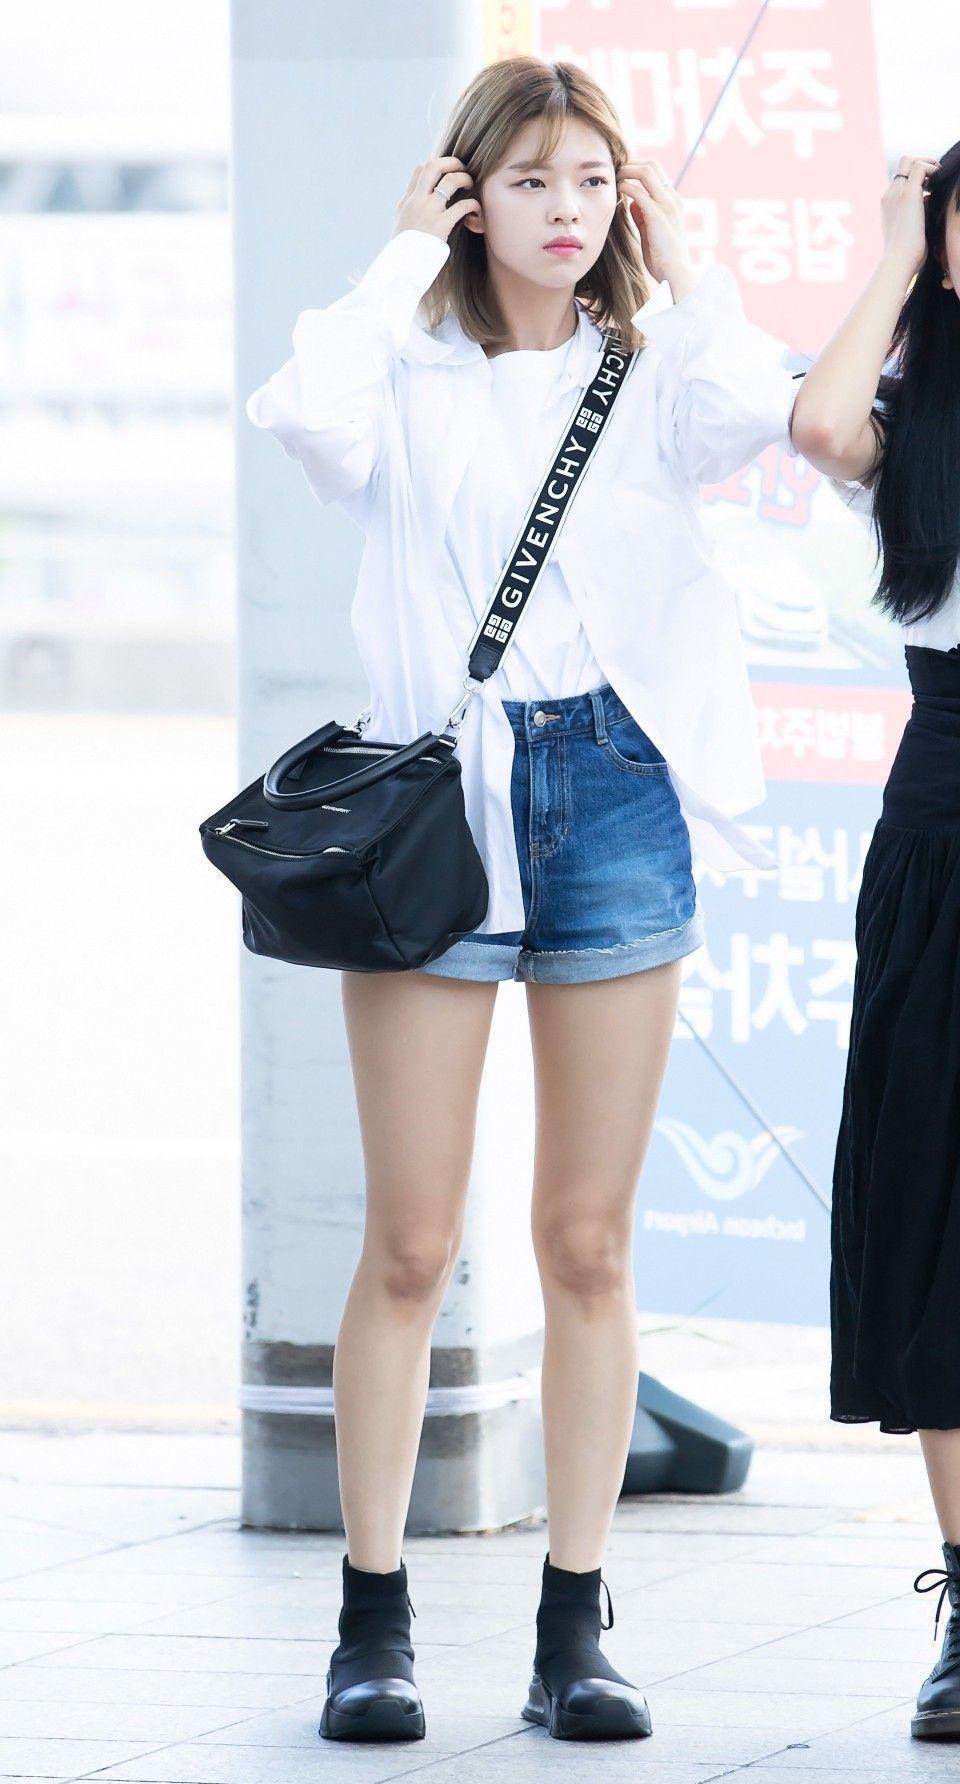 Twice Jeongyeon Kcon 2018 La Kpop Fashion Outfits Kpop Fashion Kpop Girls